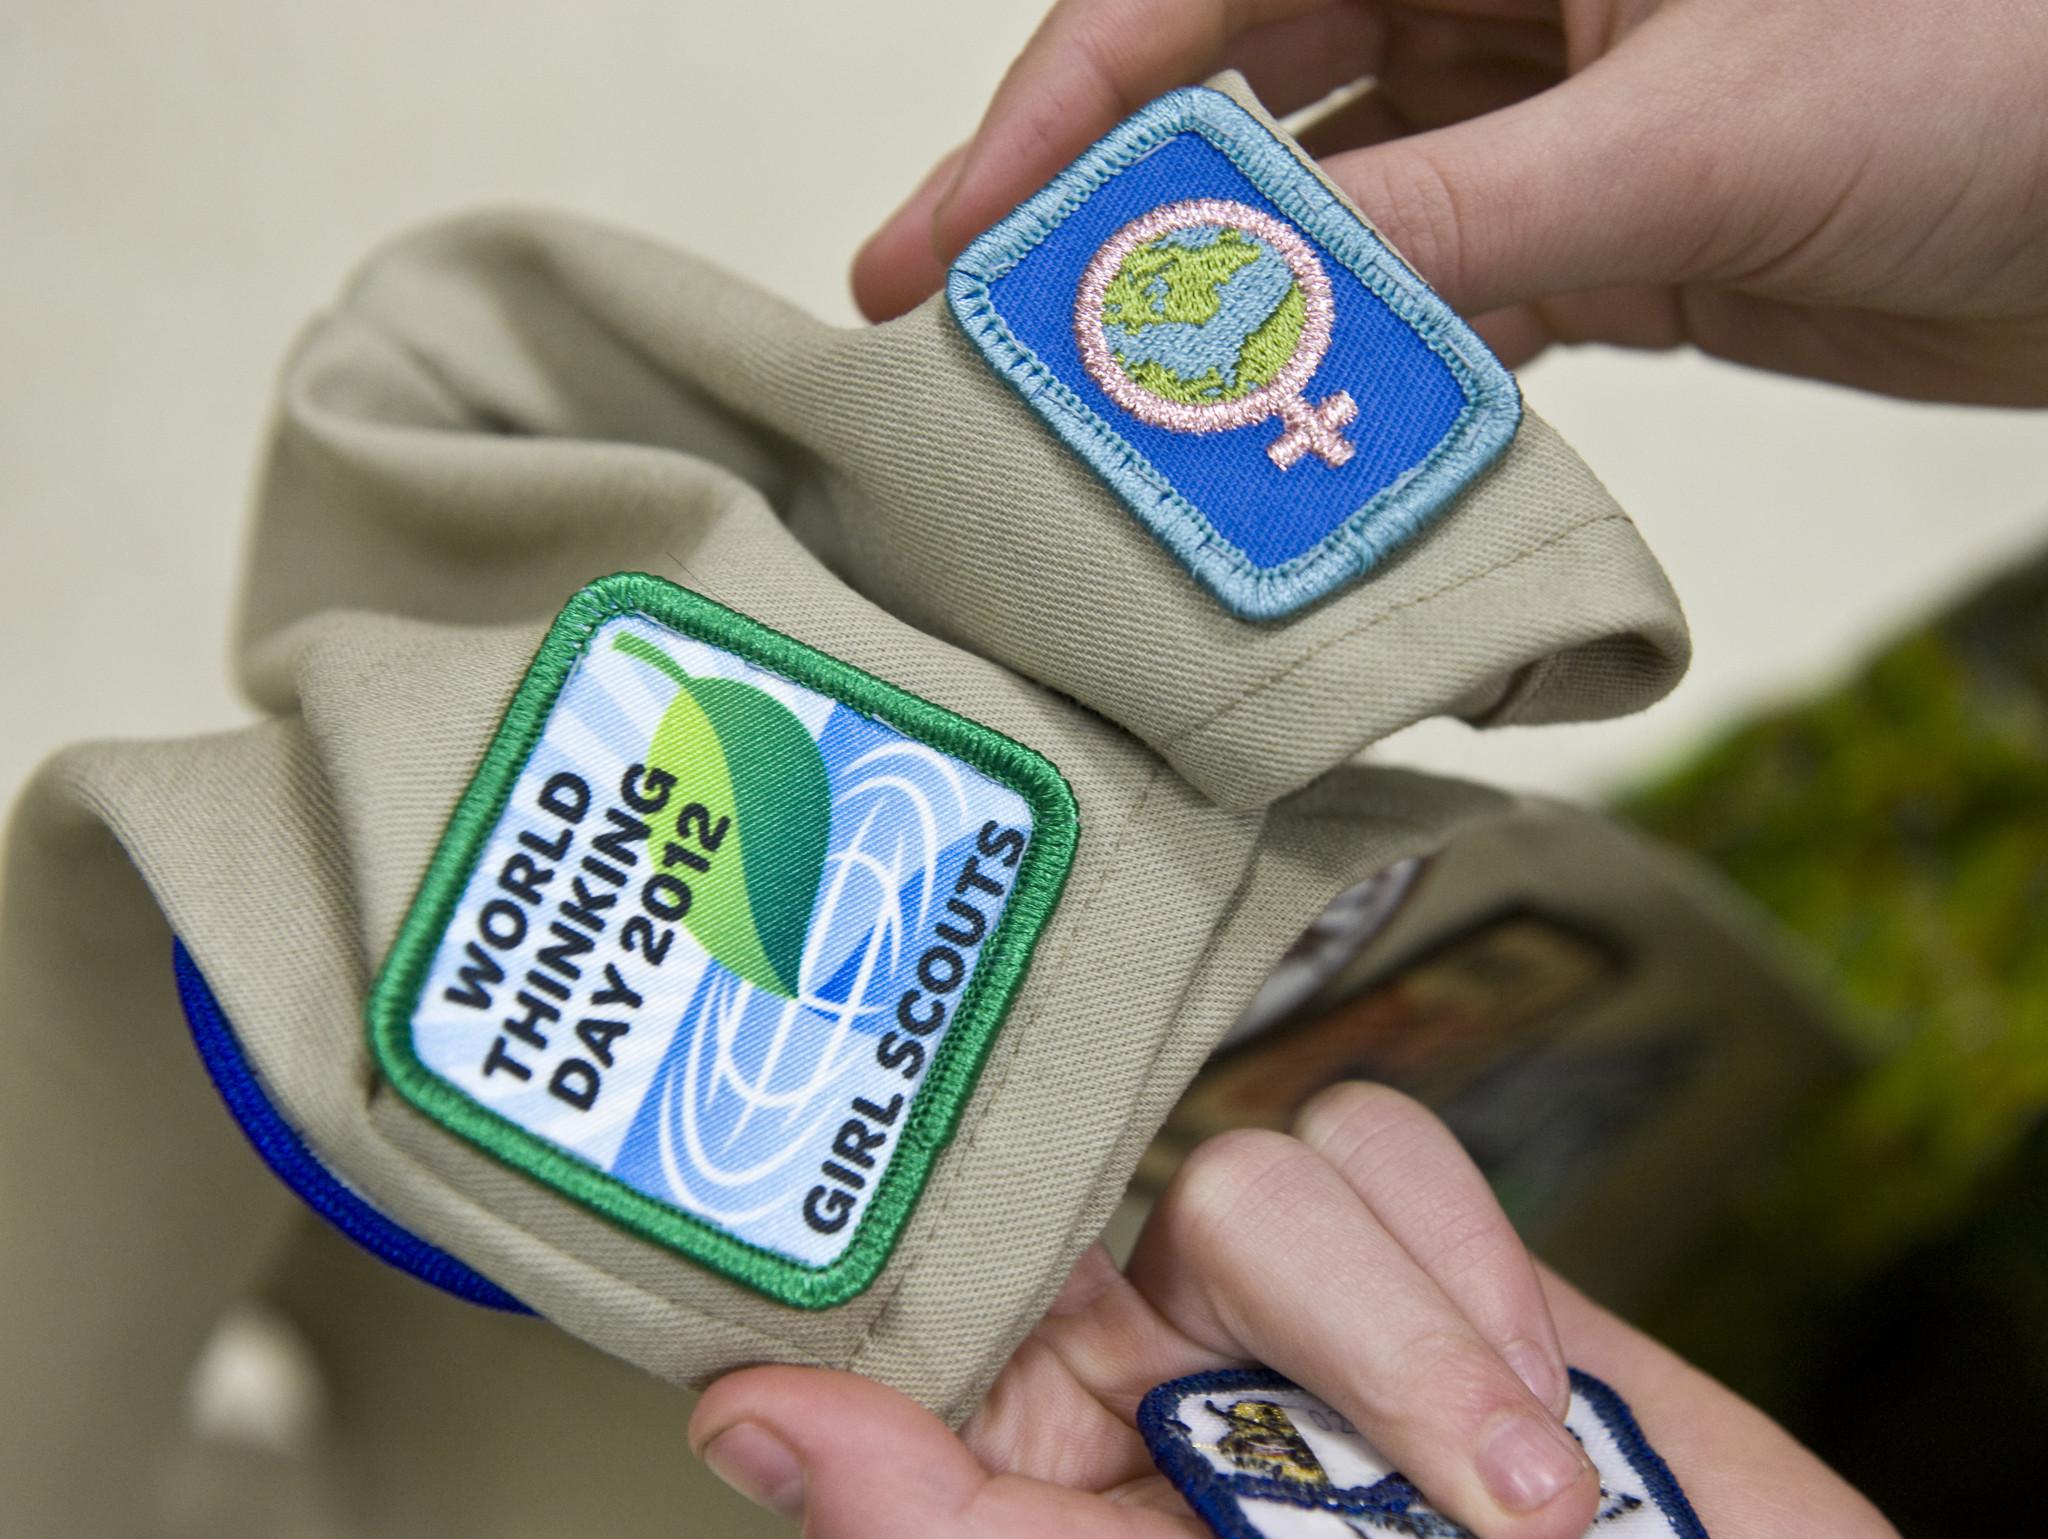 Girl Scouts refuse $100,000 anti-transgender donation